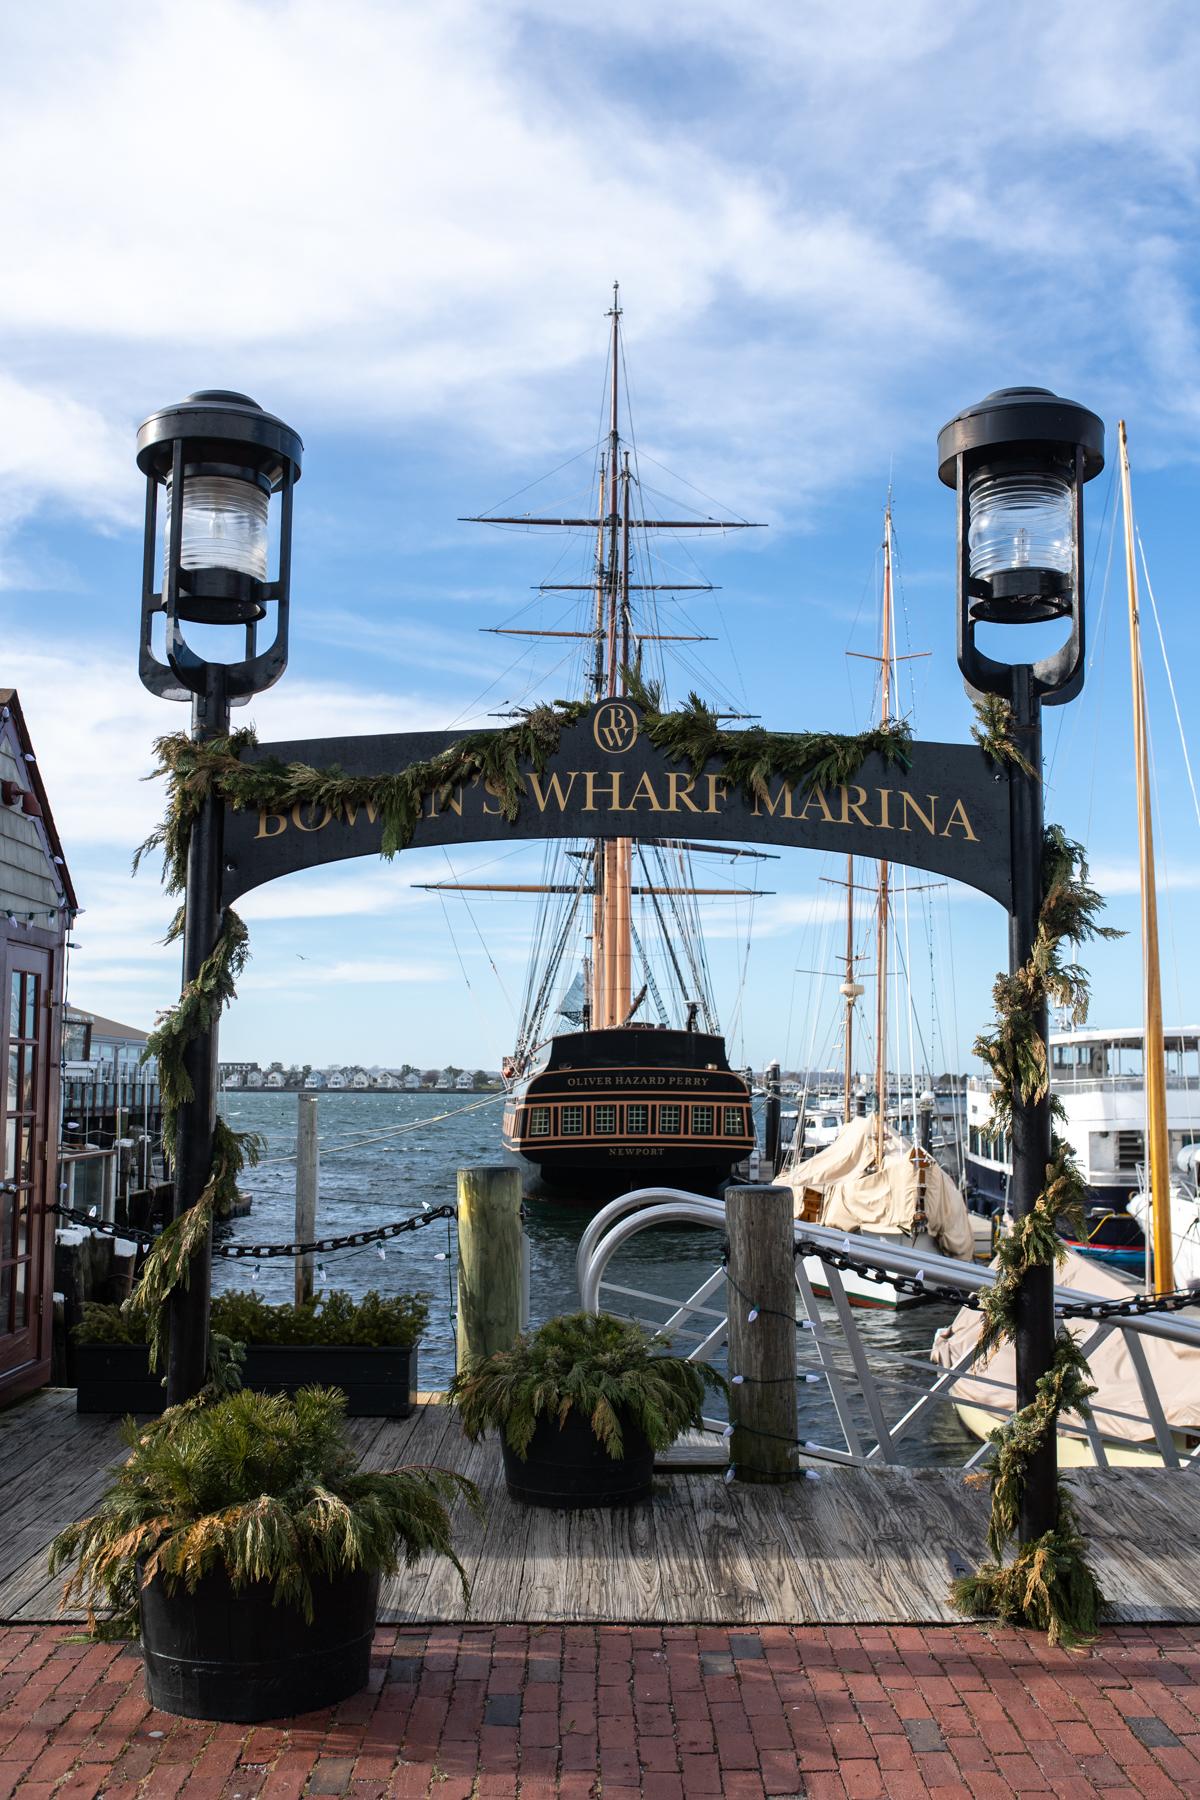 Newport%2C Rhode Island Weekend Travel Guide x Stacie Flinner-62.jpg